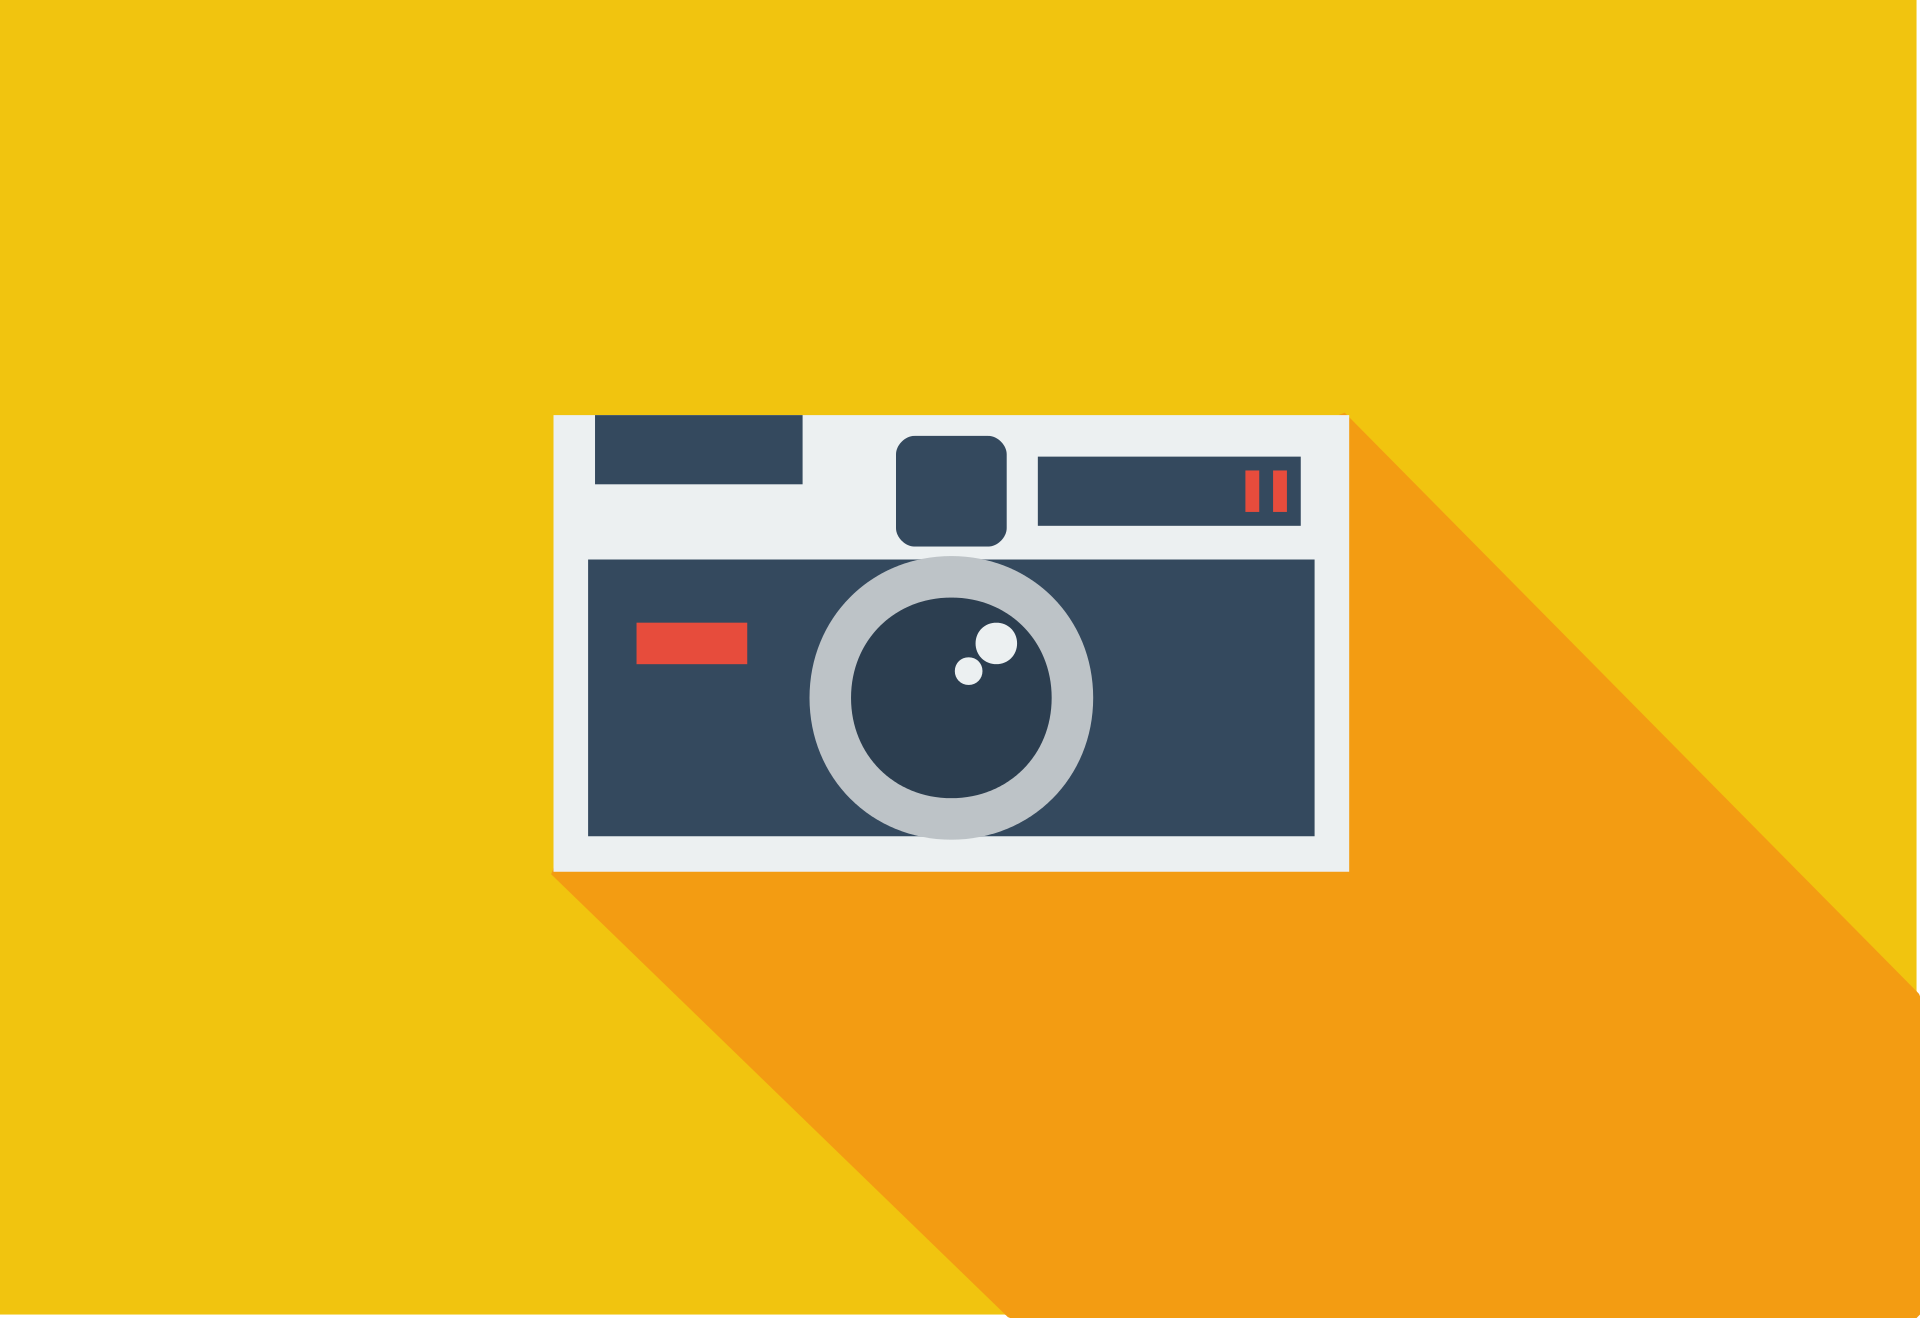 appareil photo, photographie, flat design, design plat, Jaune - Fonds d'écran HD - Professor-falken.com